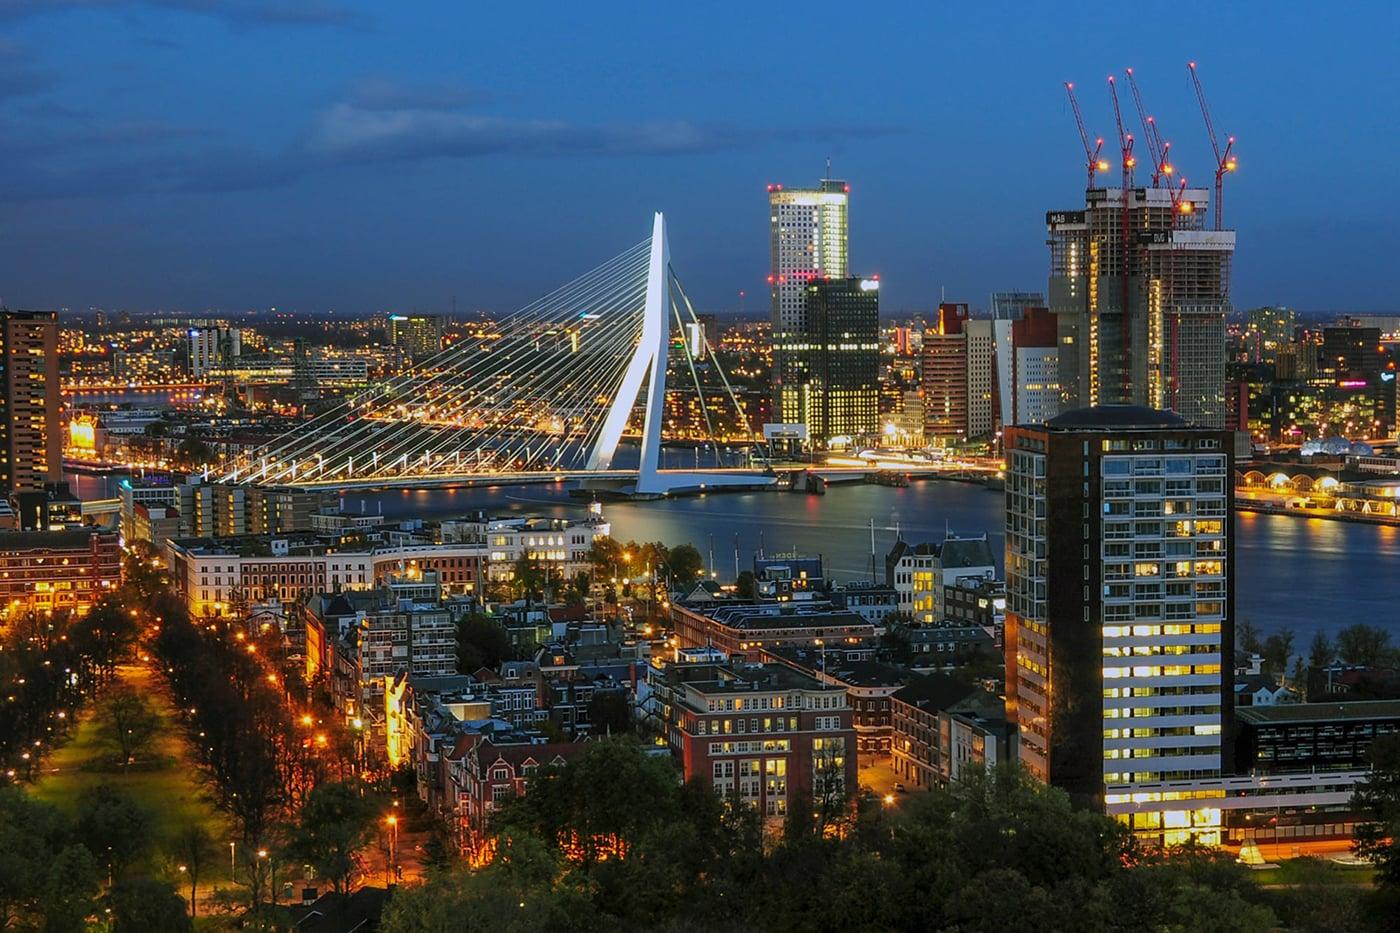 https://www.capitalonstage.com/wp-content/uploads/2017/06/Rotterdam.jpg